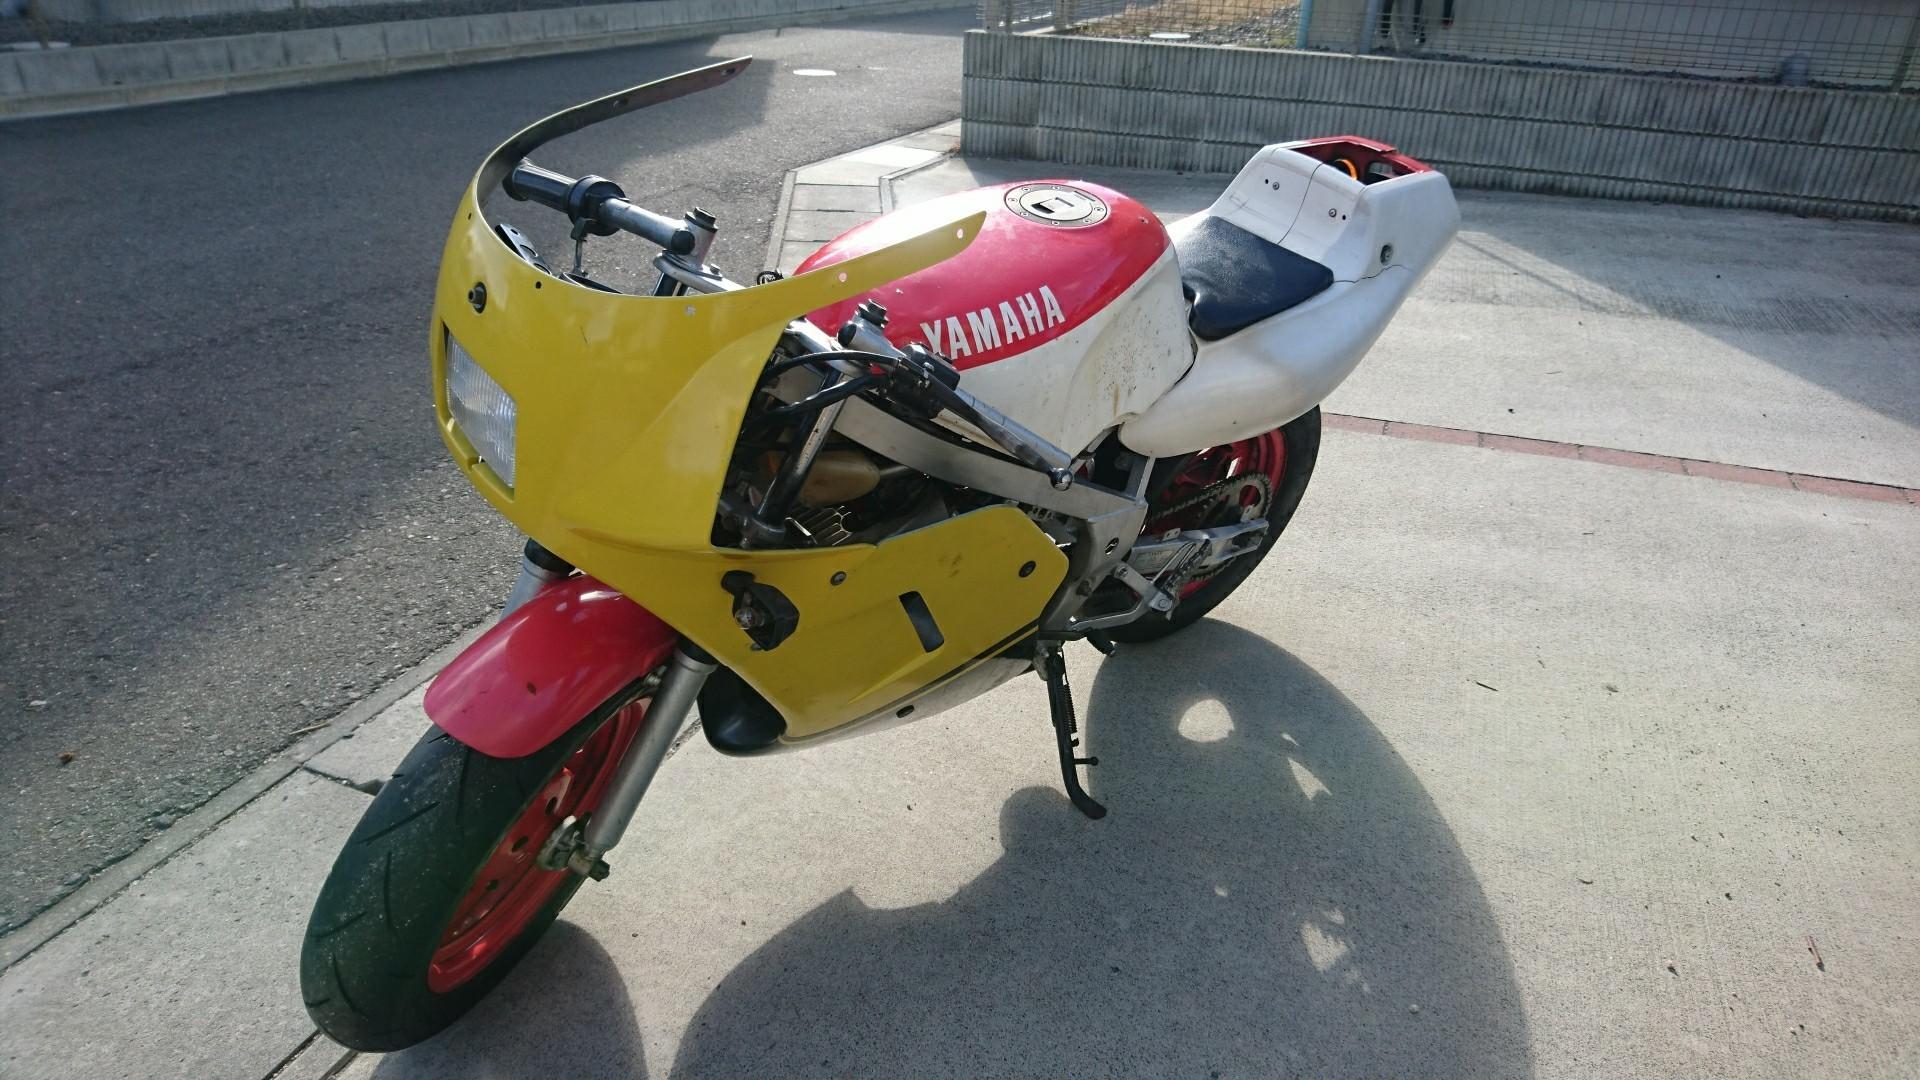 k453さんのYSR50/80